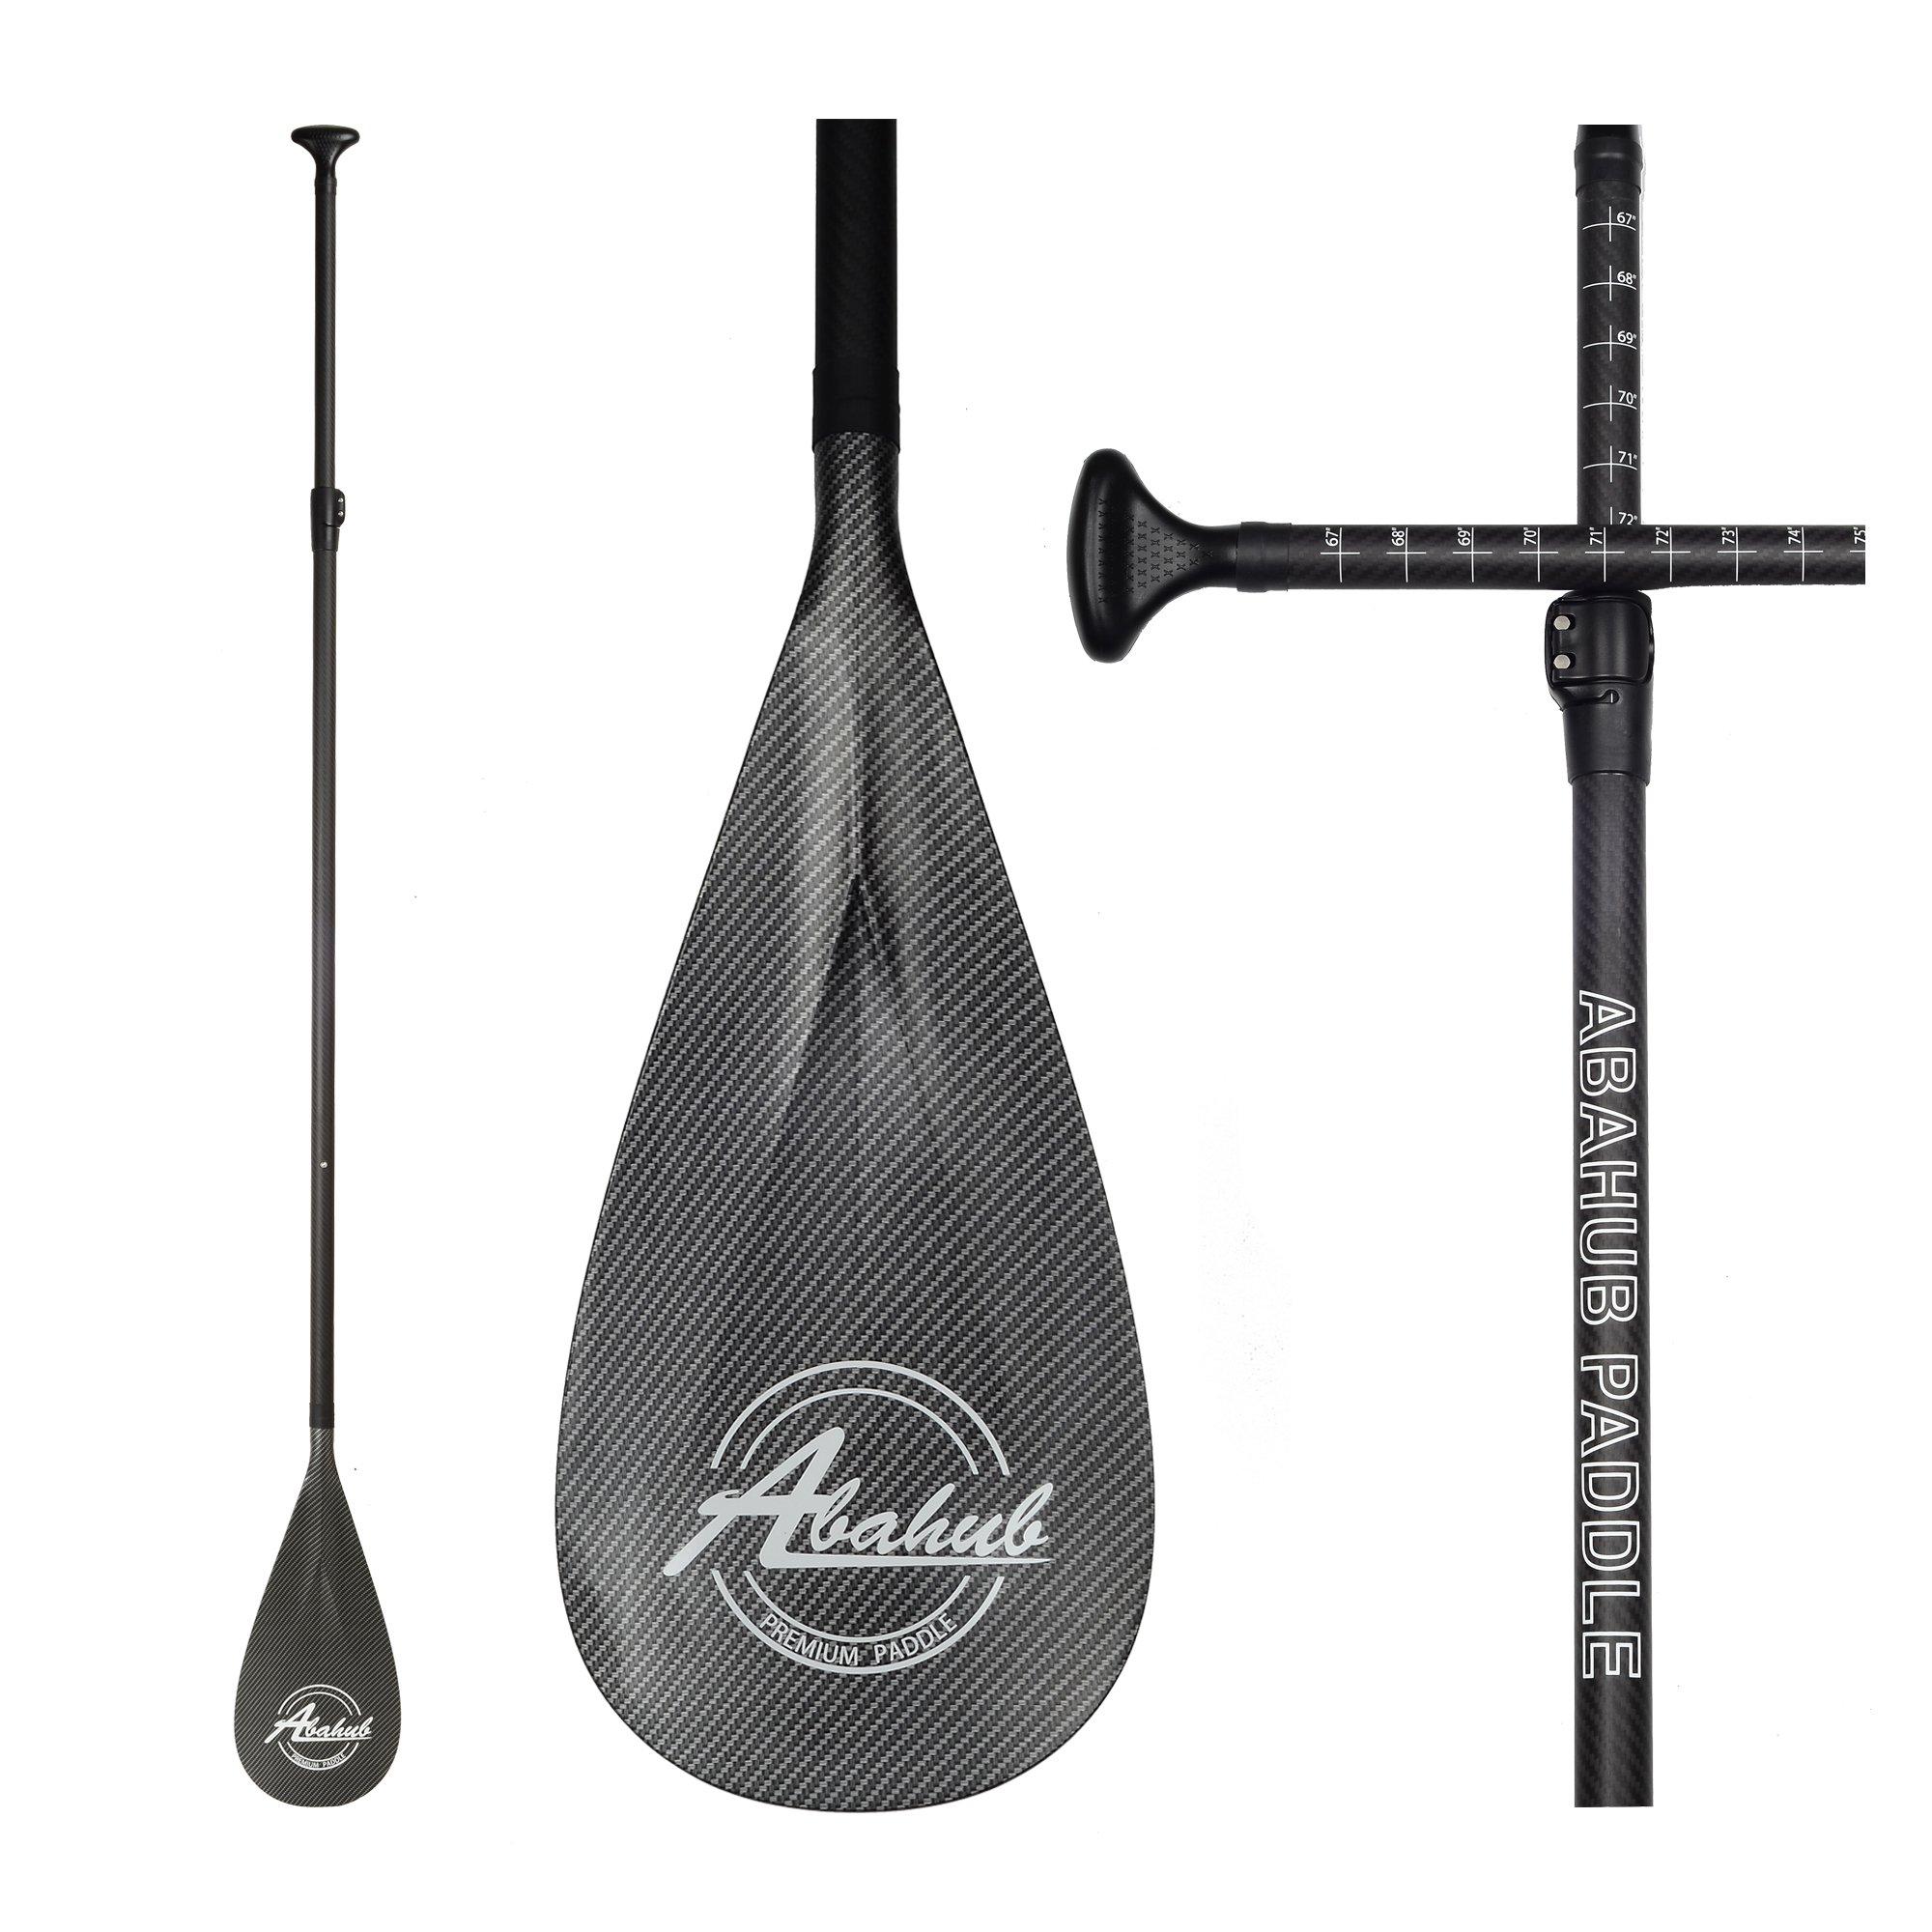 ABAHUB 3-Piece Adjustable Carbon Fiber SUP Paddle Carbon Shaft Carbon Print Plastic Blade + Bag